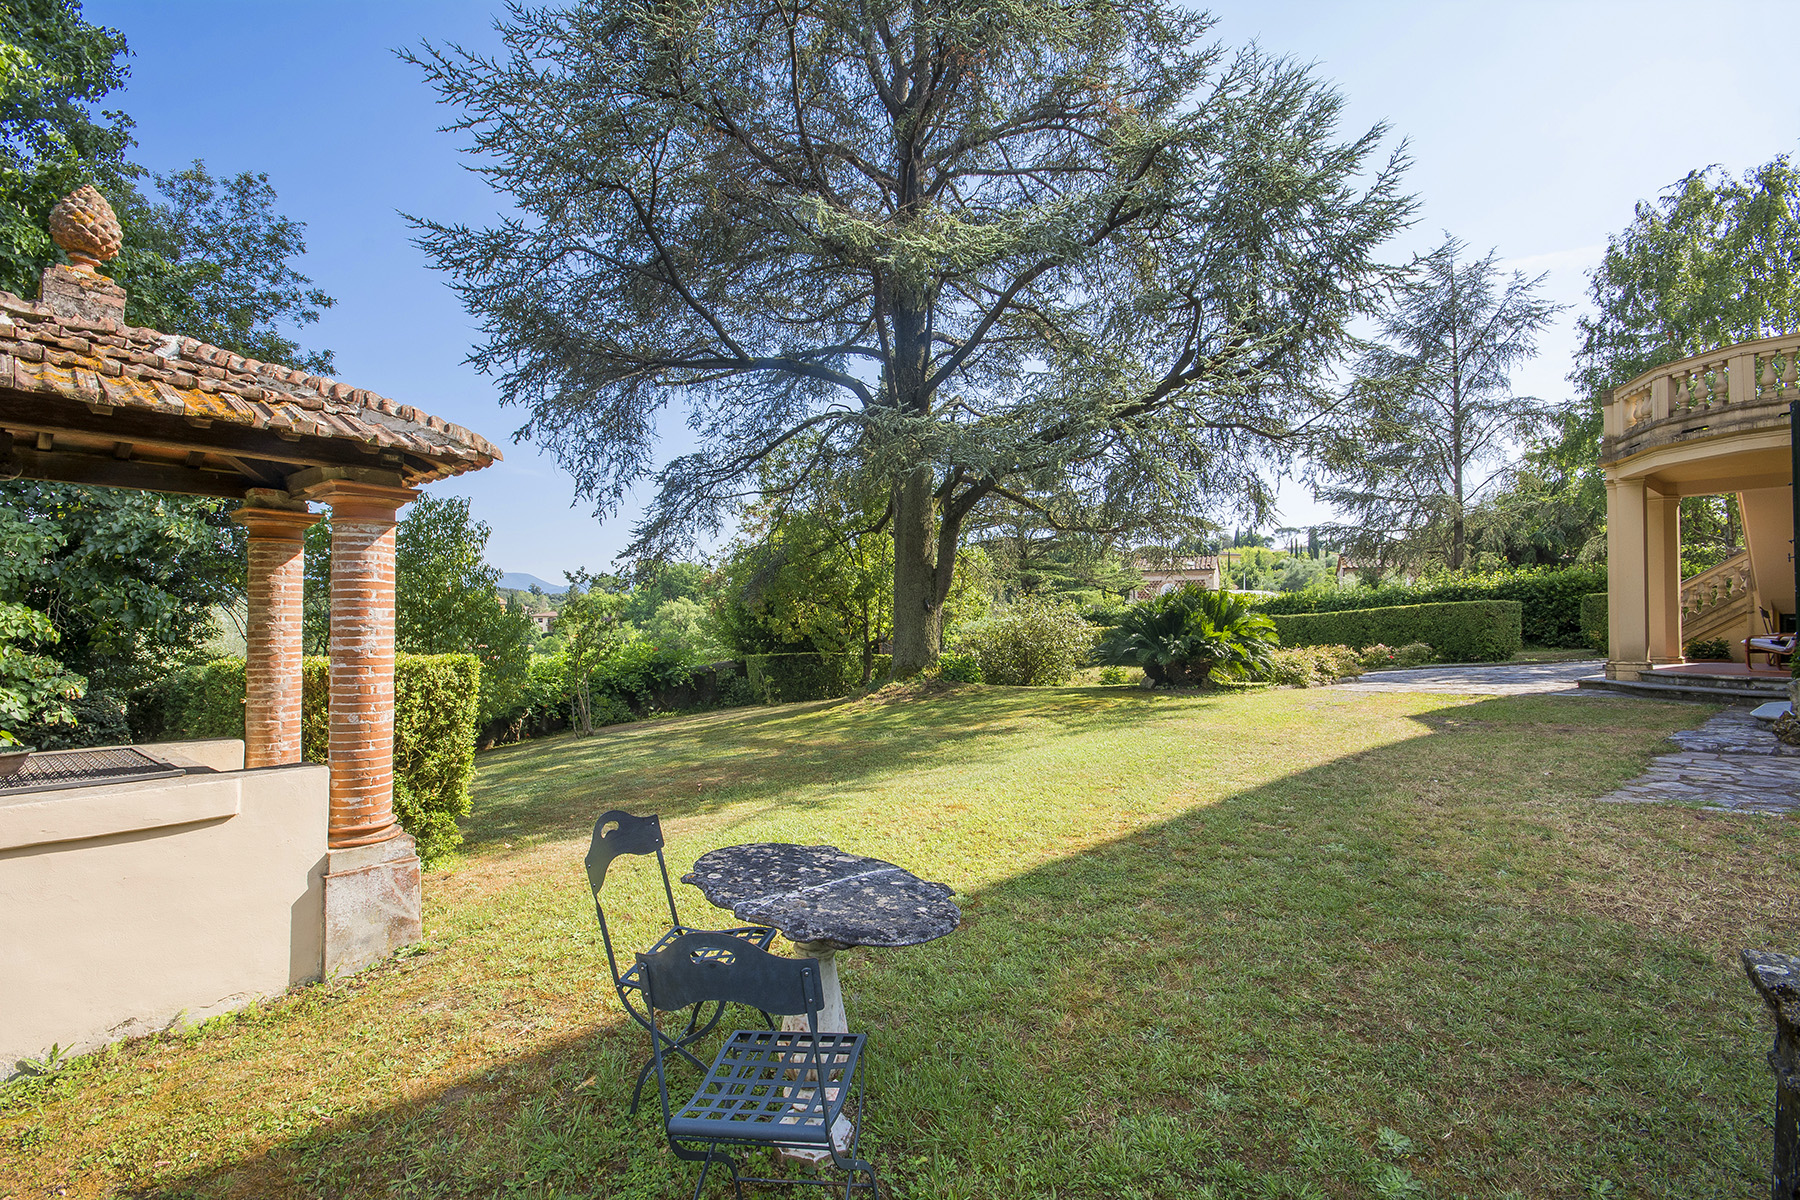 Villa in Vendita a Lucca: 5 locali, 1150 mq - Foto 27